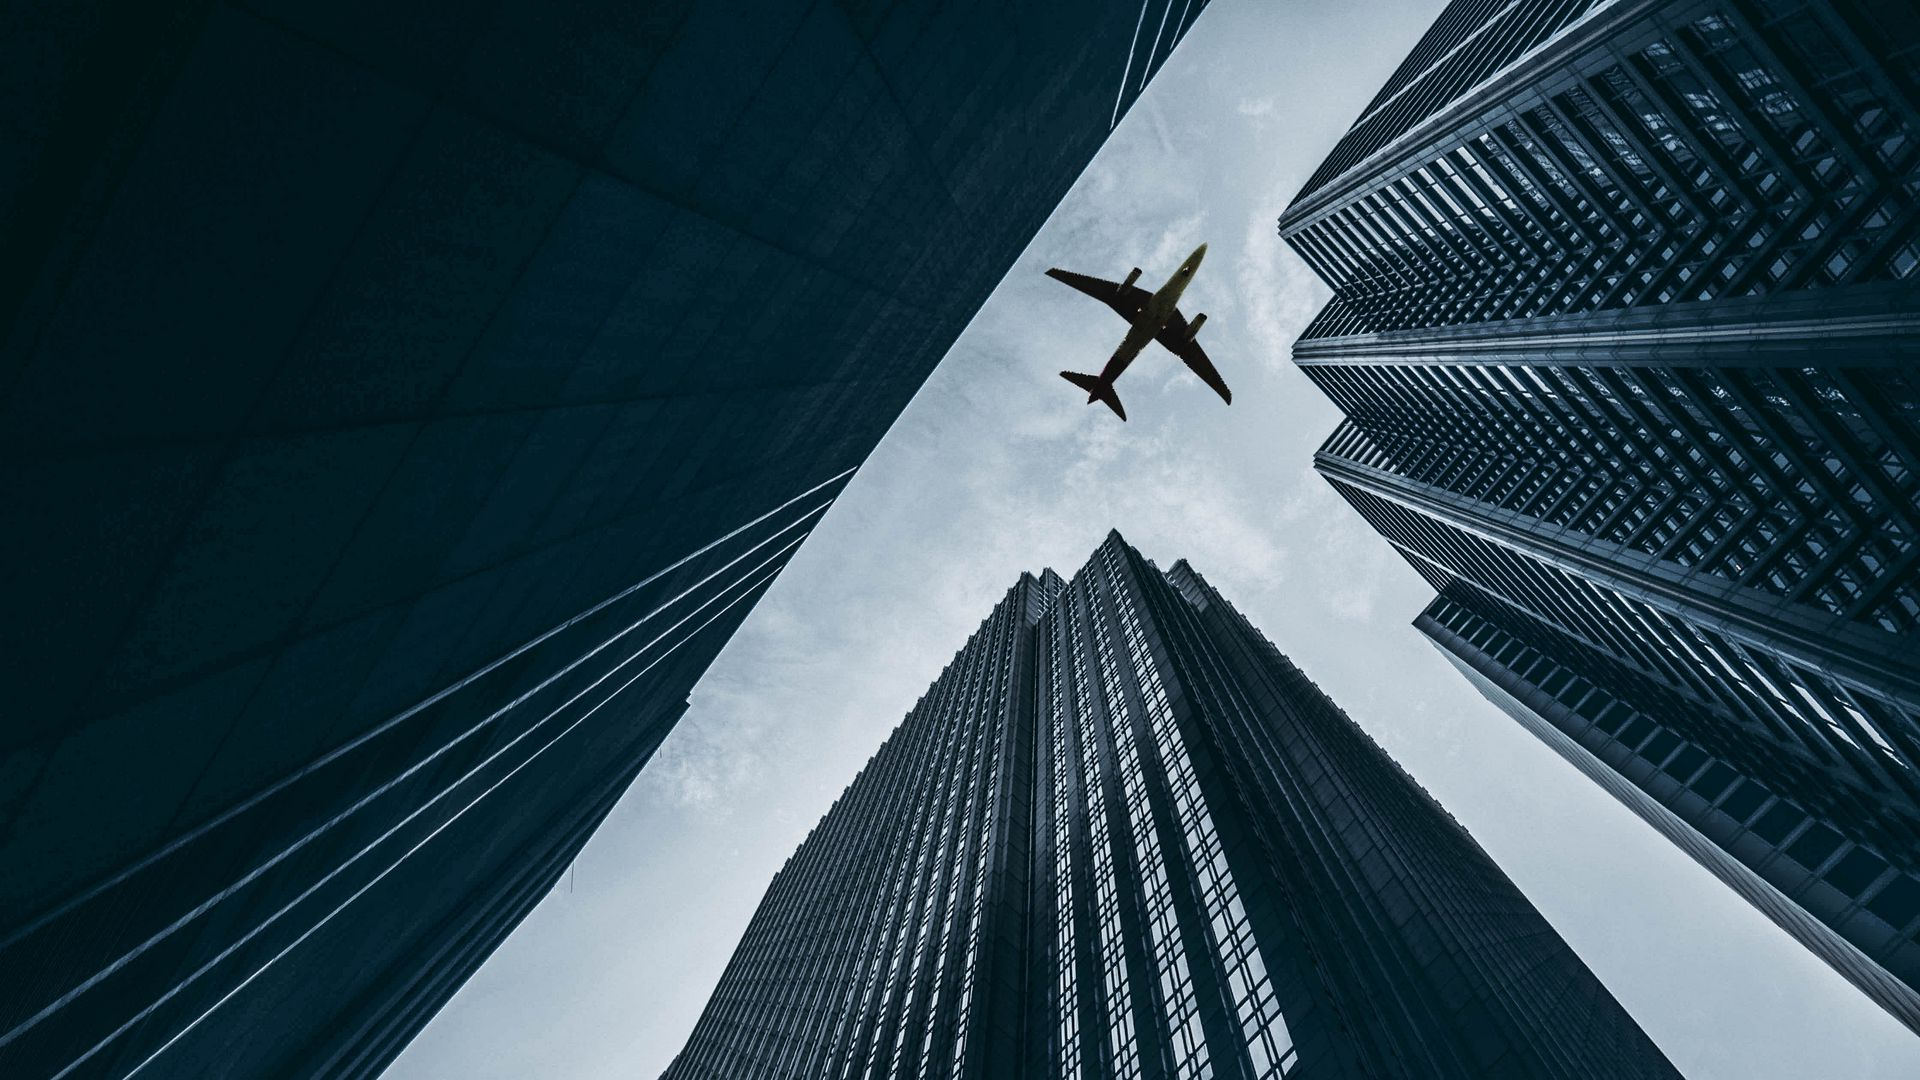 Airplane, Buildings, Skyscrapers, Sky Wallpapers Free Download